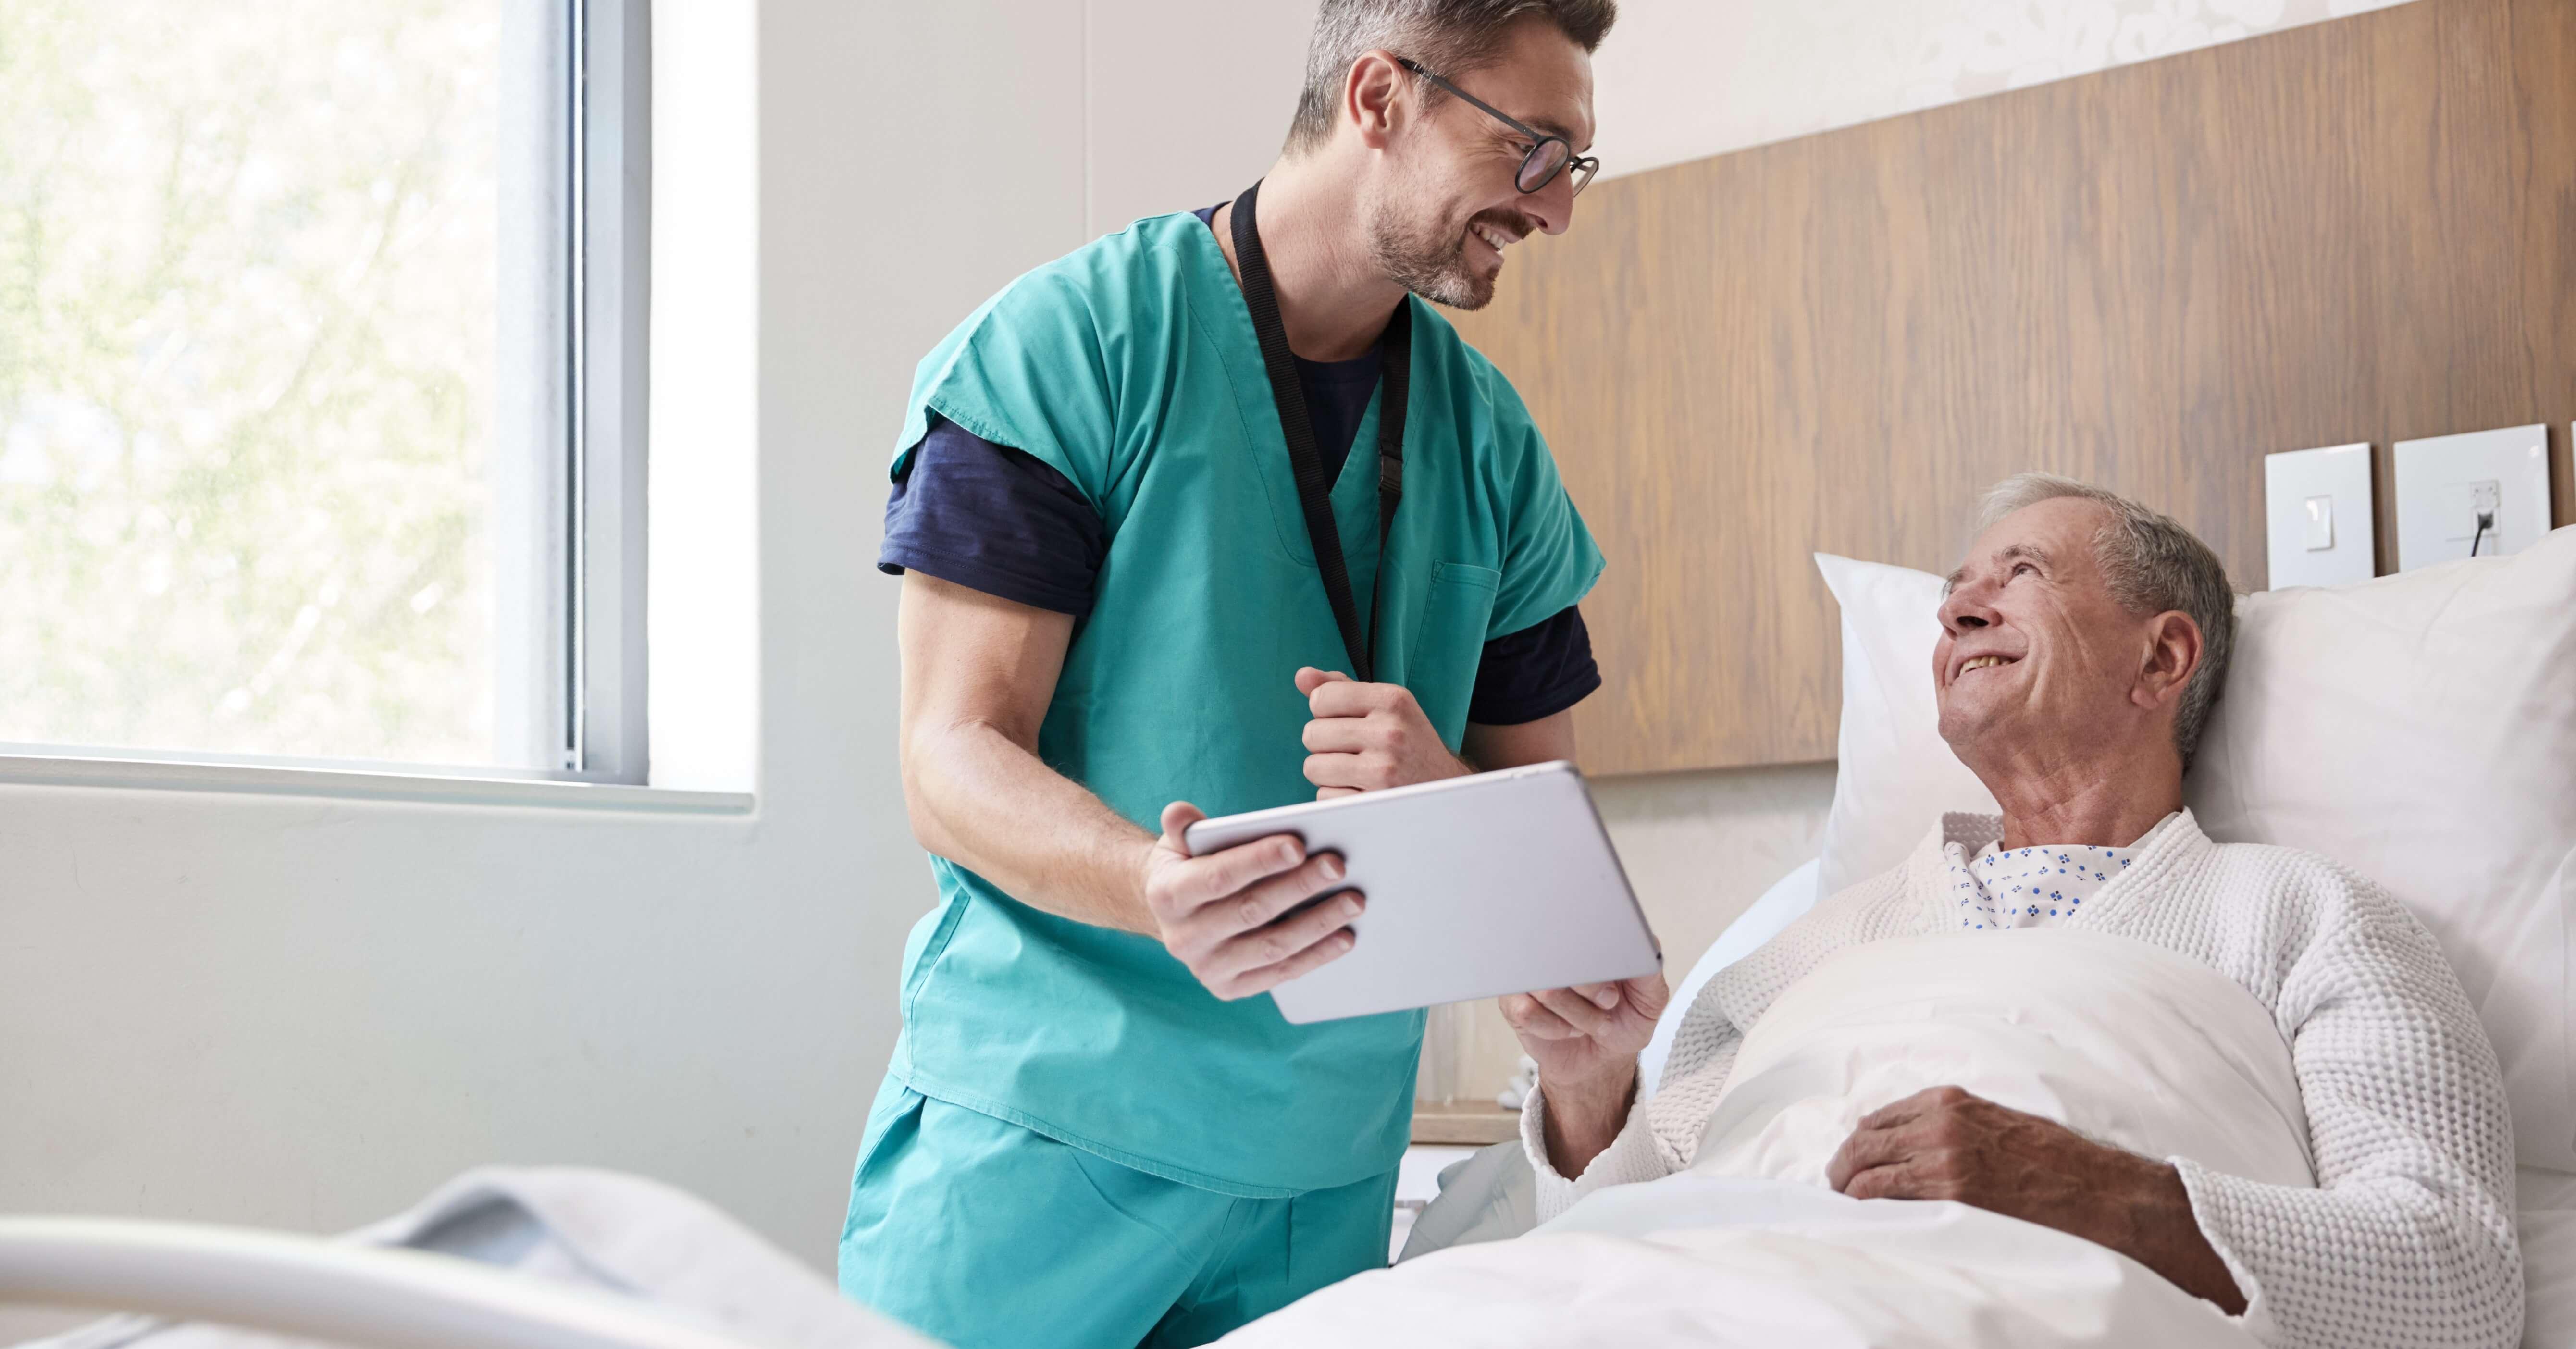 doctor and patient using patient engagement platform